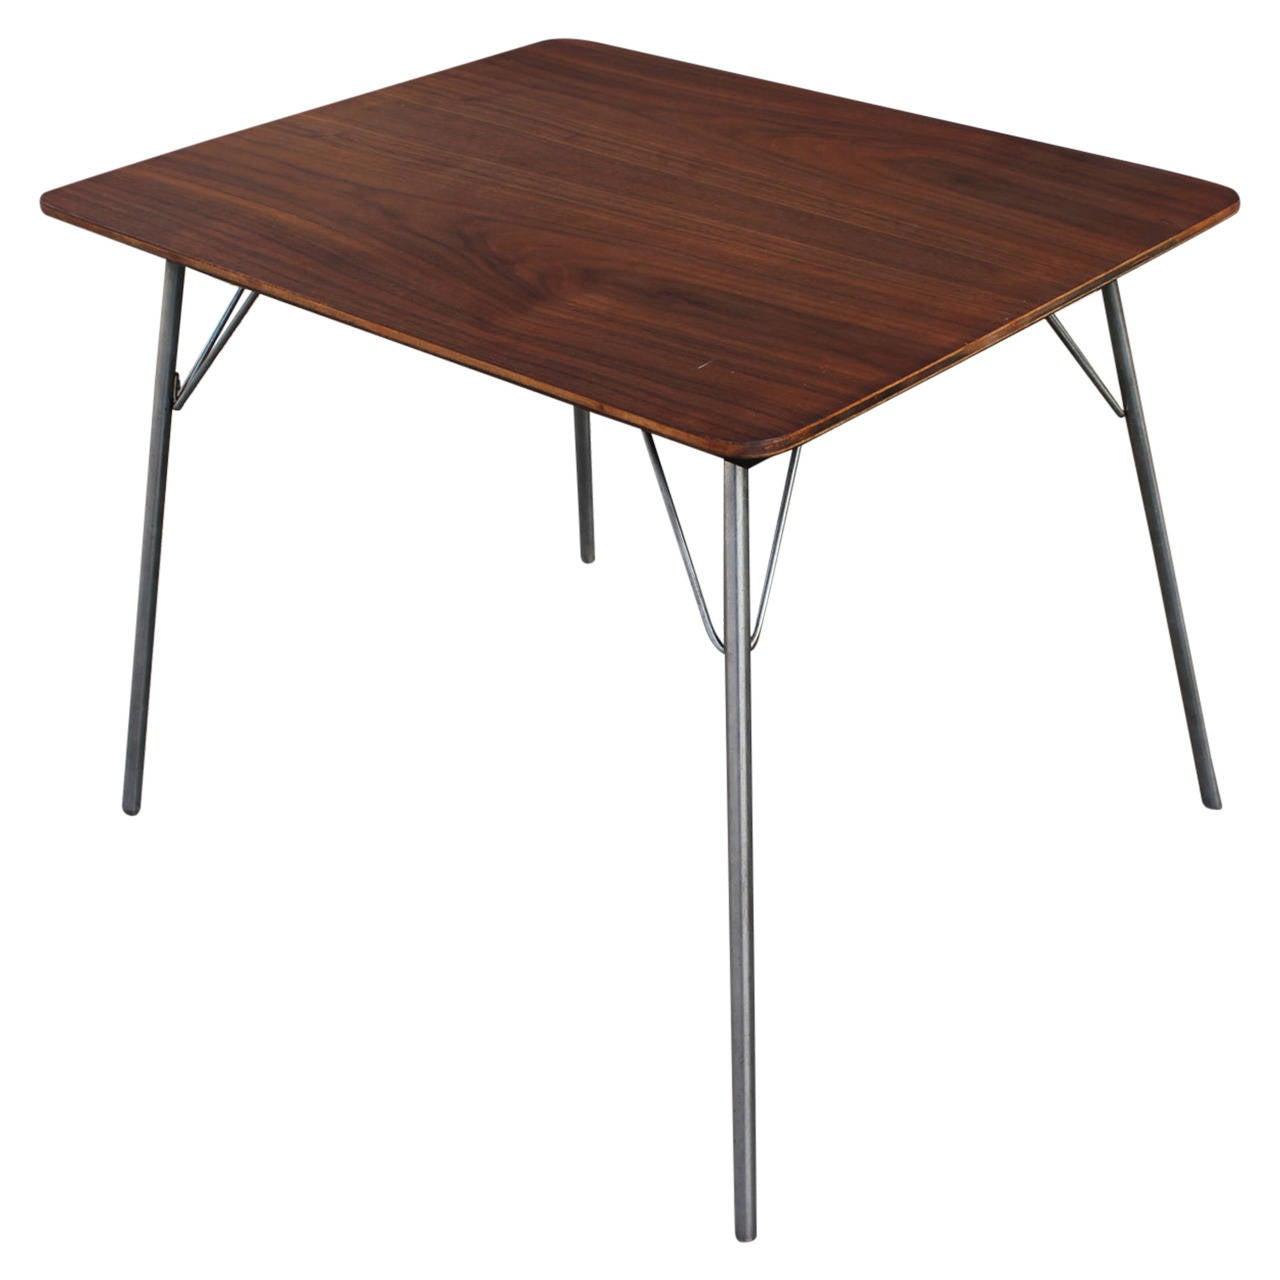 Rare Eames For Herman Miller IT 1 / Incidental Table Walnut 1